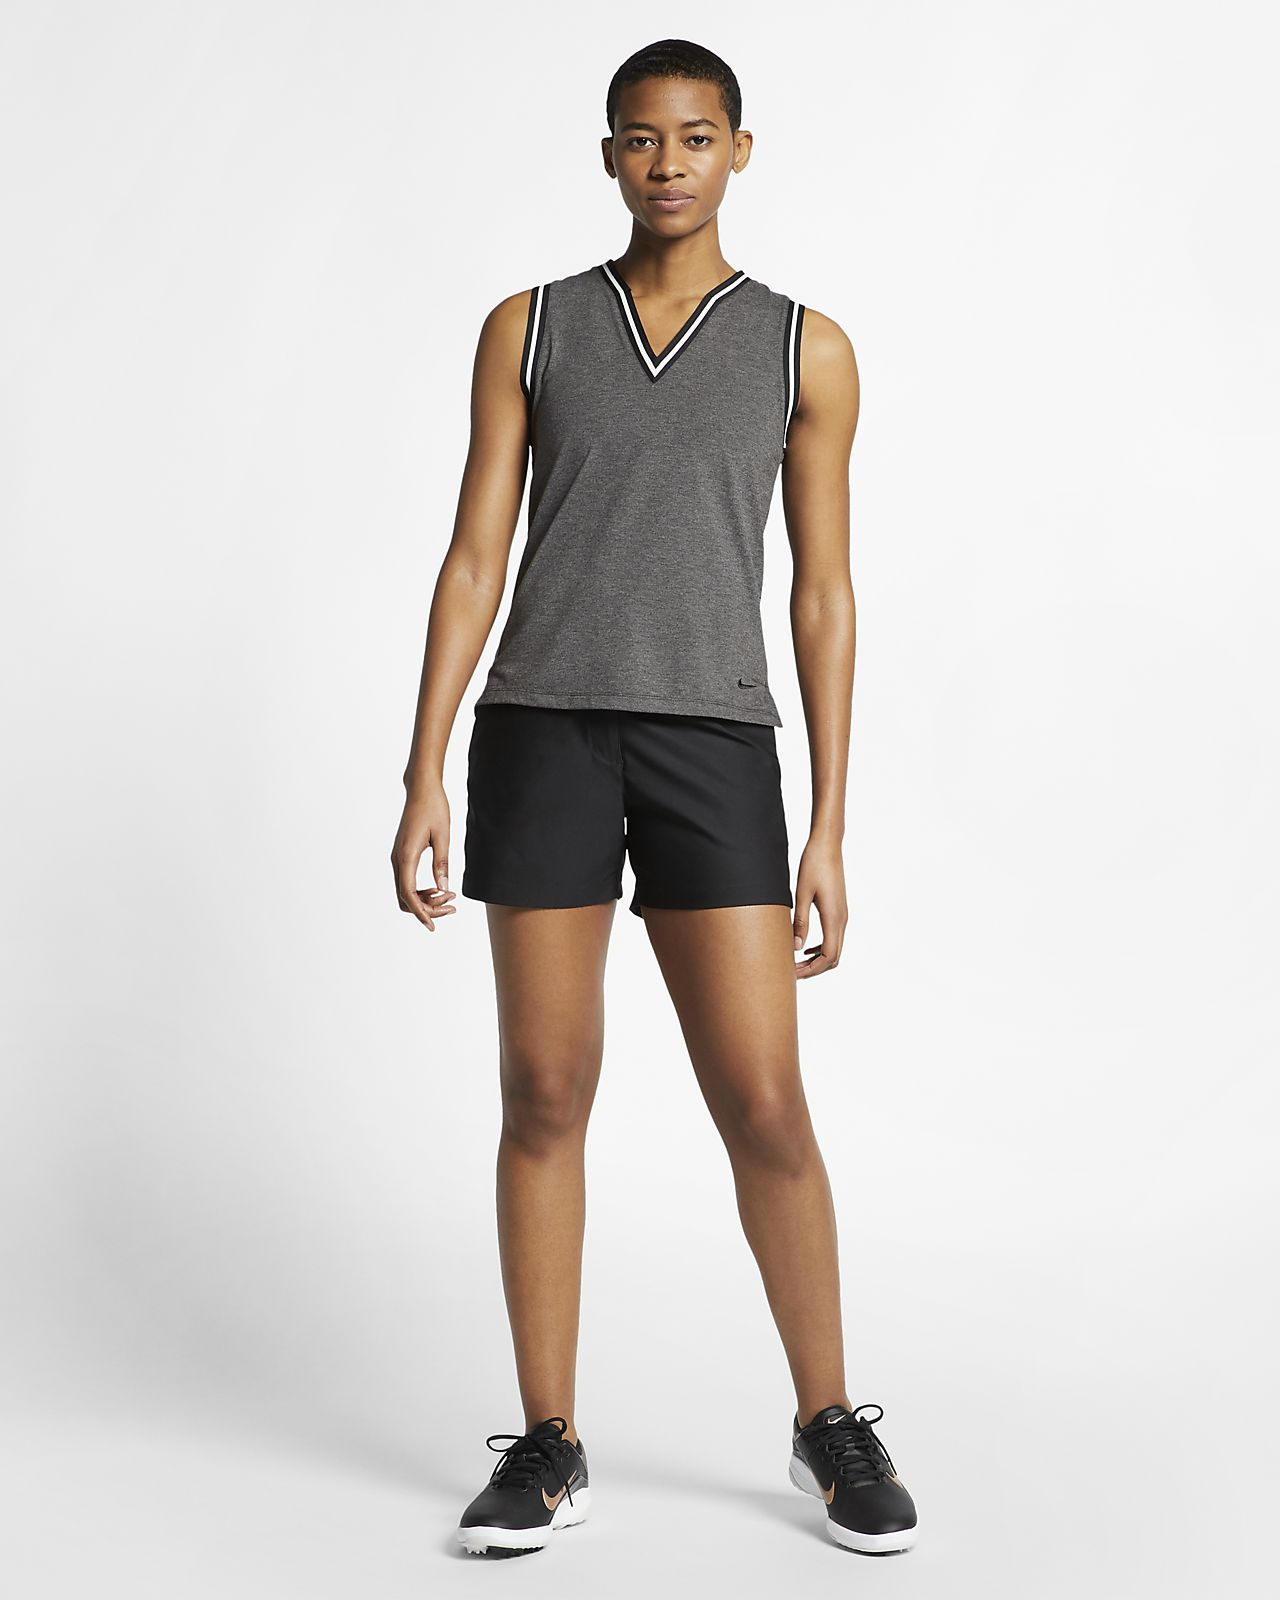 e36e5720d9e6 Γυναικεία αμάνικη μπλούζα πόλο για γκολφ Nike Dri-FIT. Nike.com GR